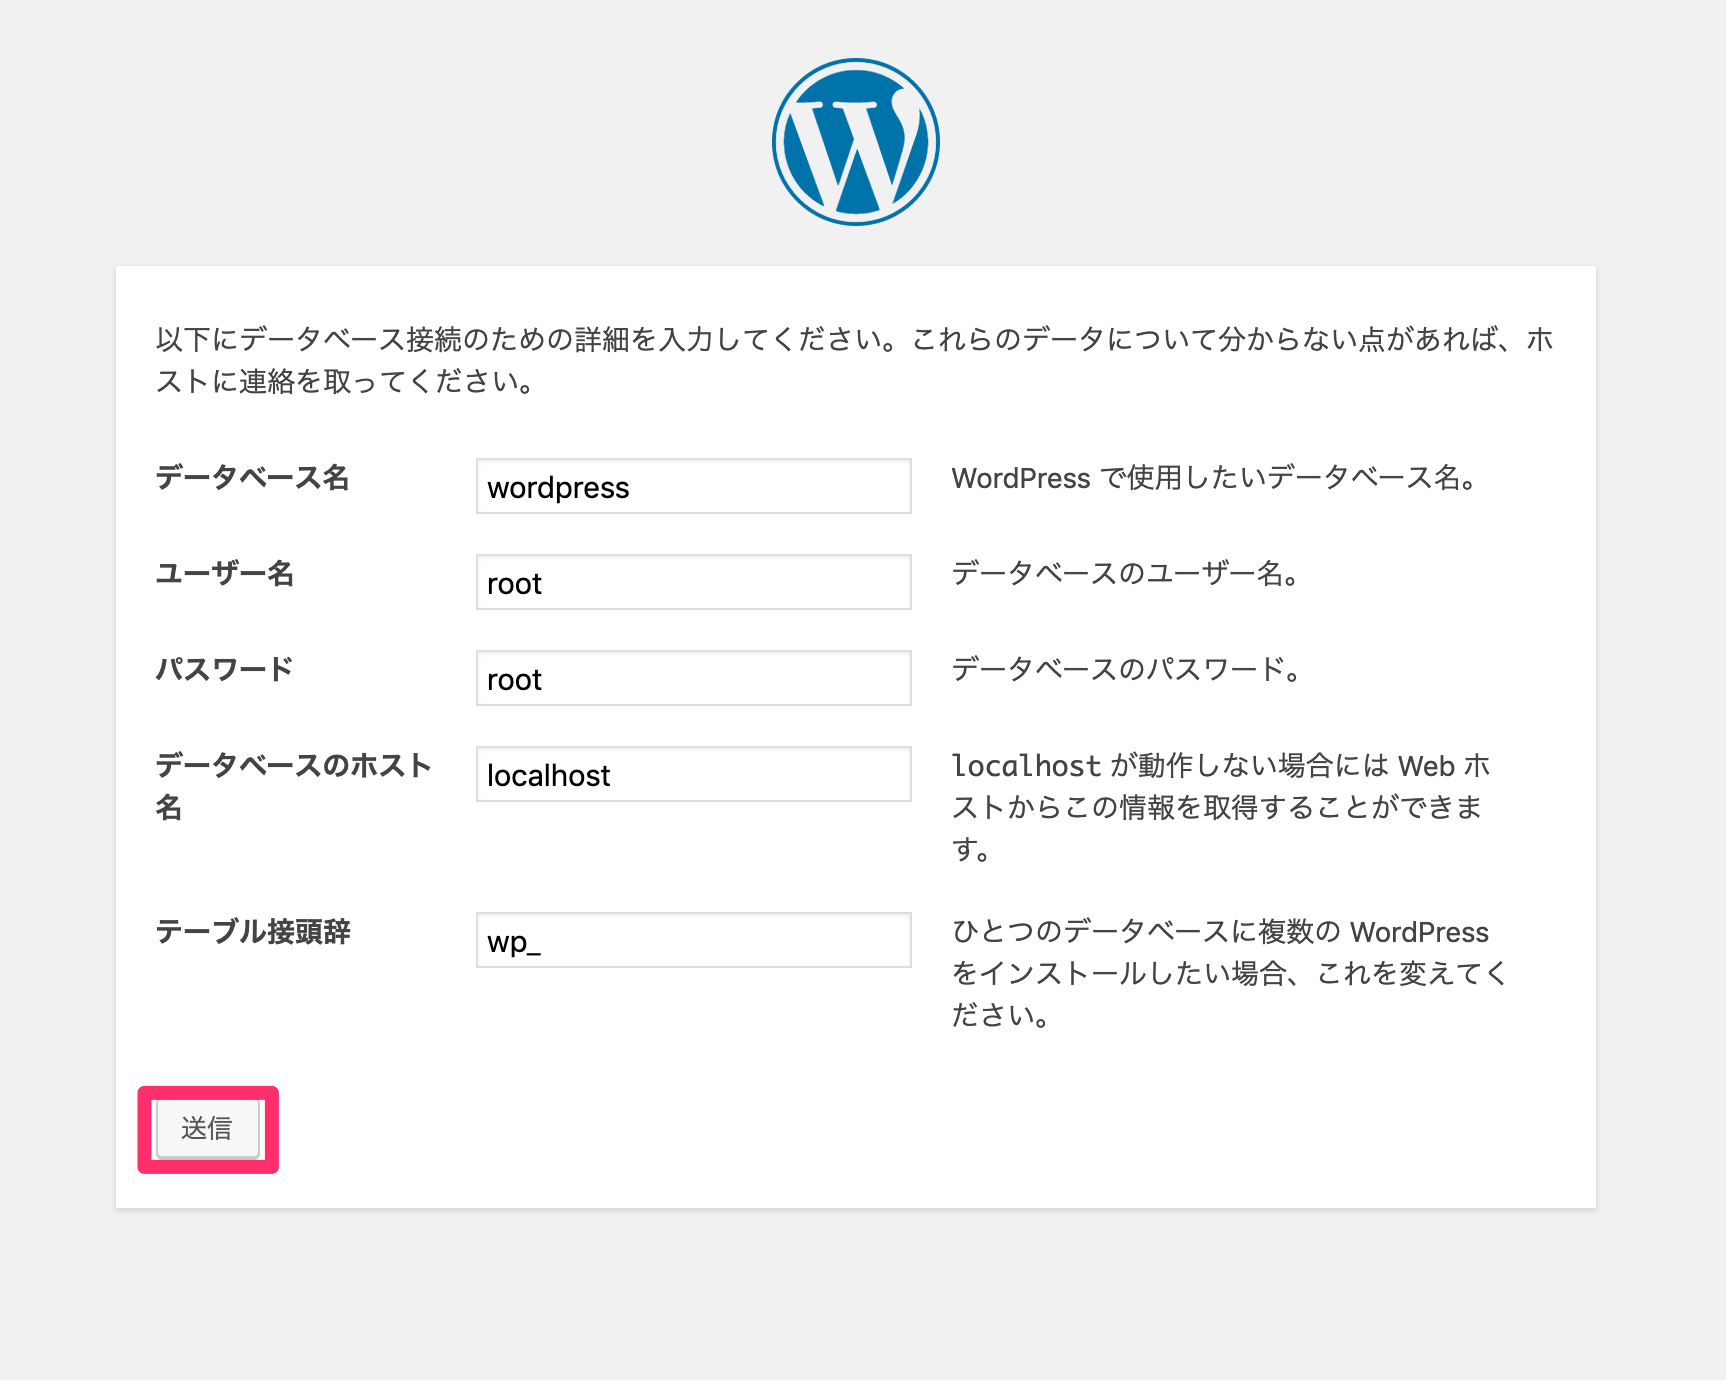 Mac)MAMP を 使 っ て WordPress を イ ン ス ト-ル す る 方 法 - Qiita